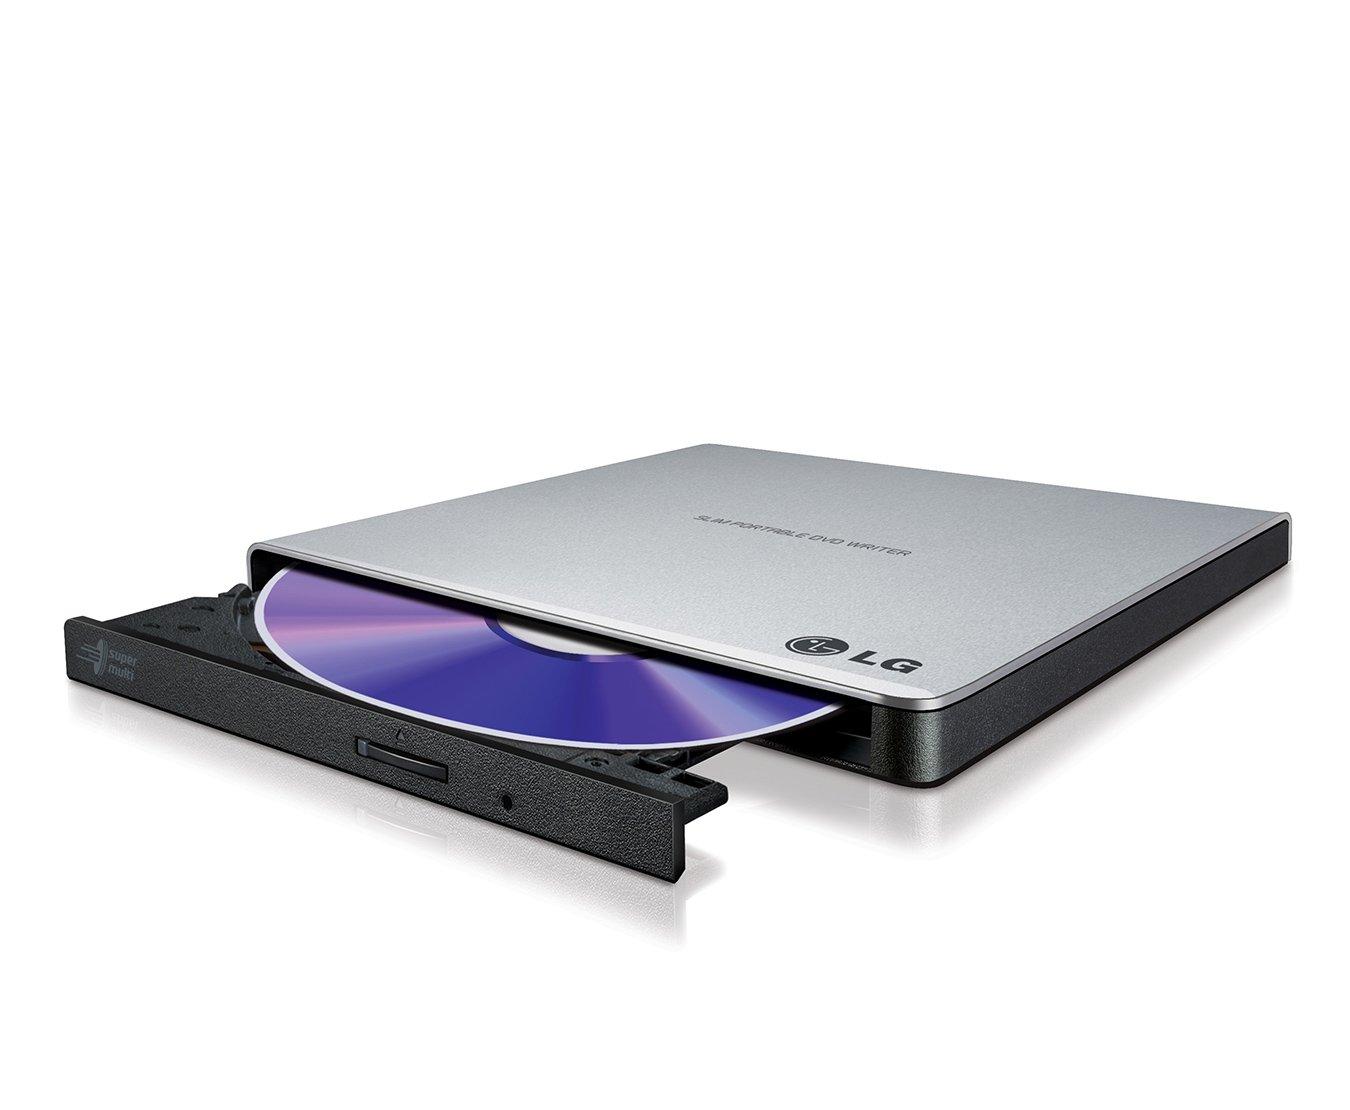 LG GP57ES40 External Ultra Portable Slim DVD-RW Black, Silver